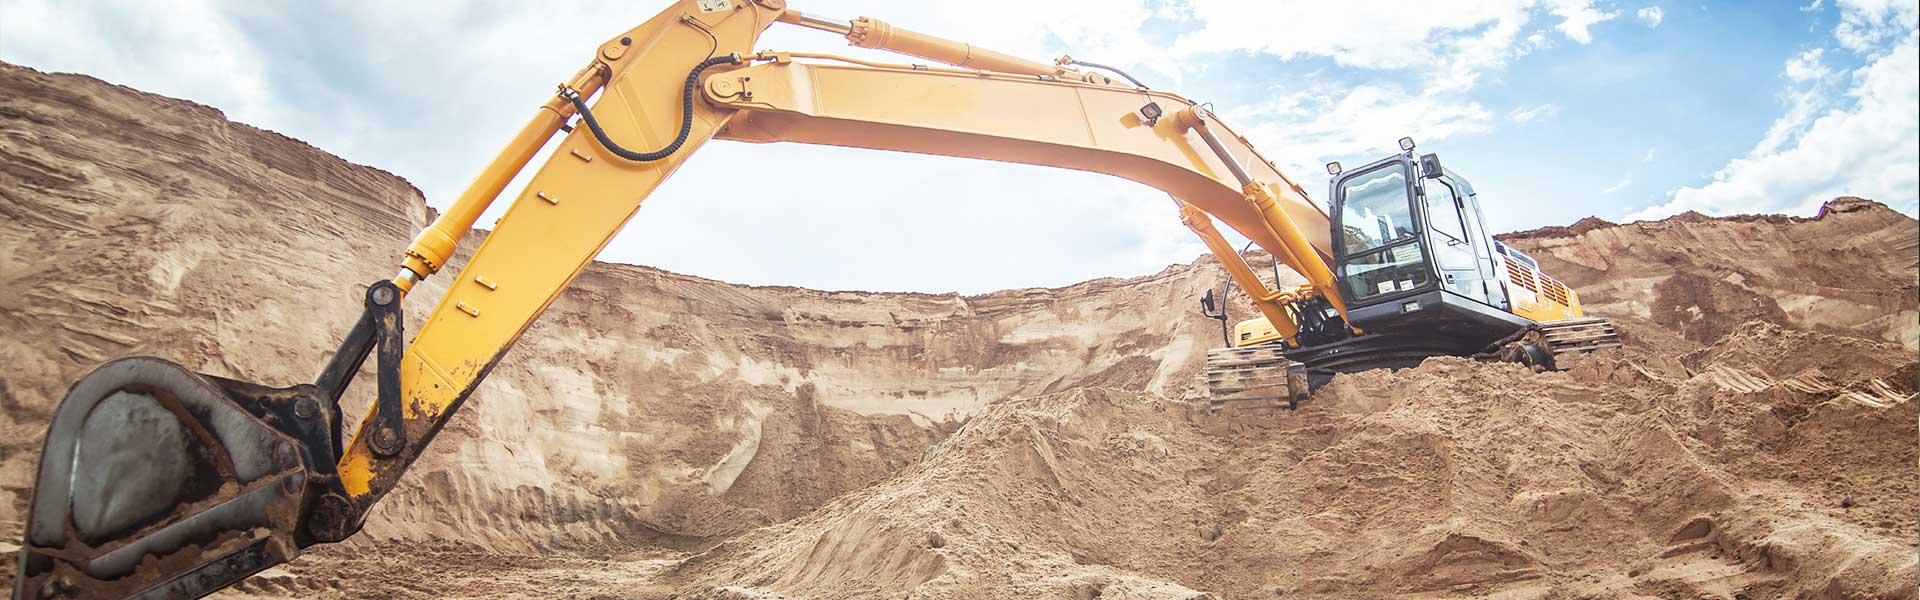 15 Minutes 3D Inspection on Excavator Stick Shaft Hole?